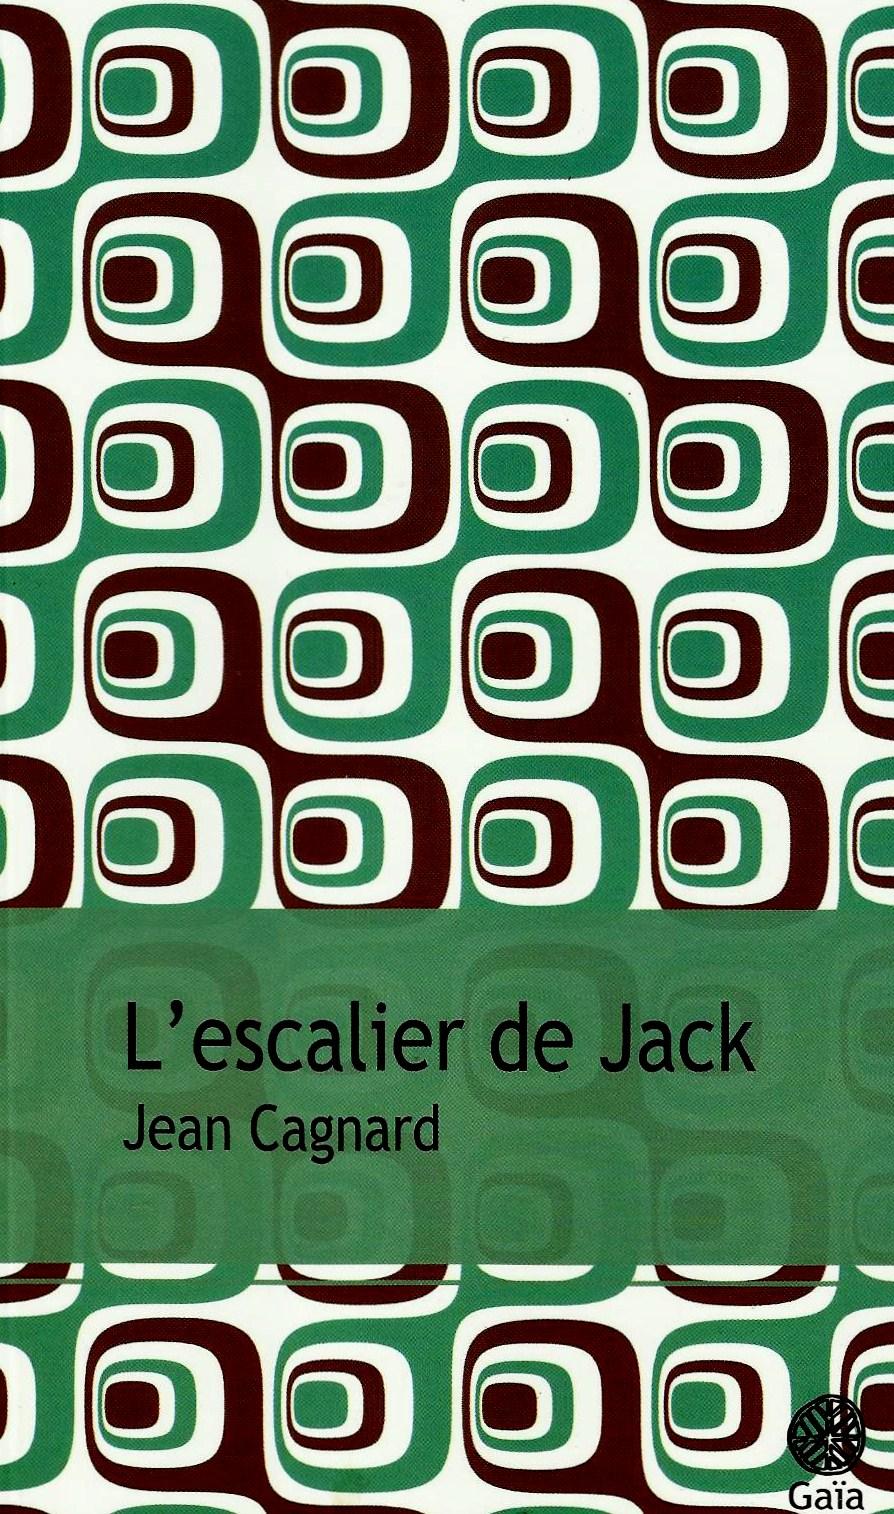 http://klima47.files.wordpress.com/2012/11/cagnard-jean-lescalier-de-jack.jpg